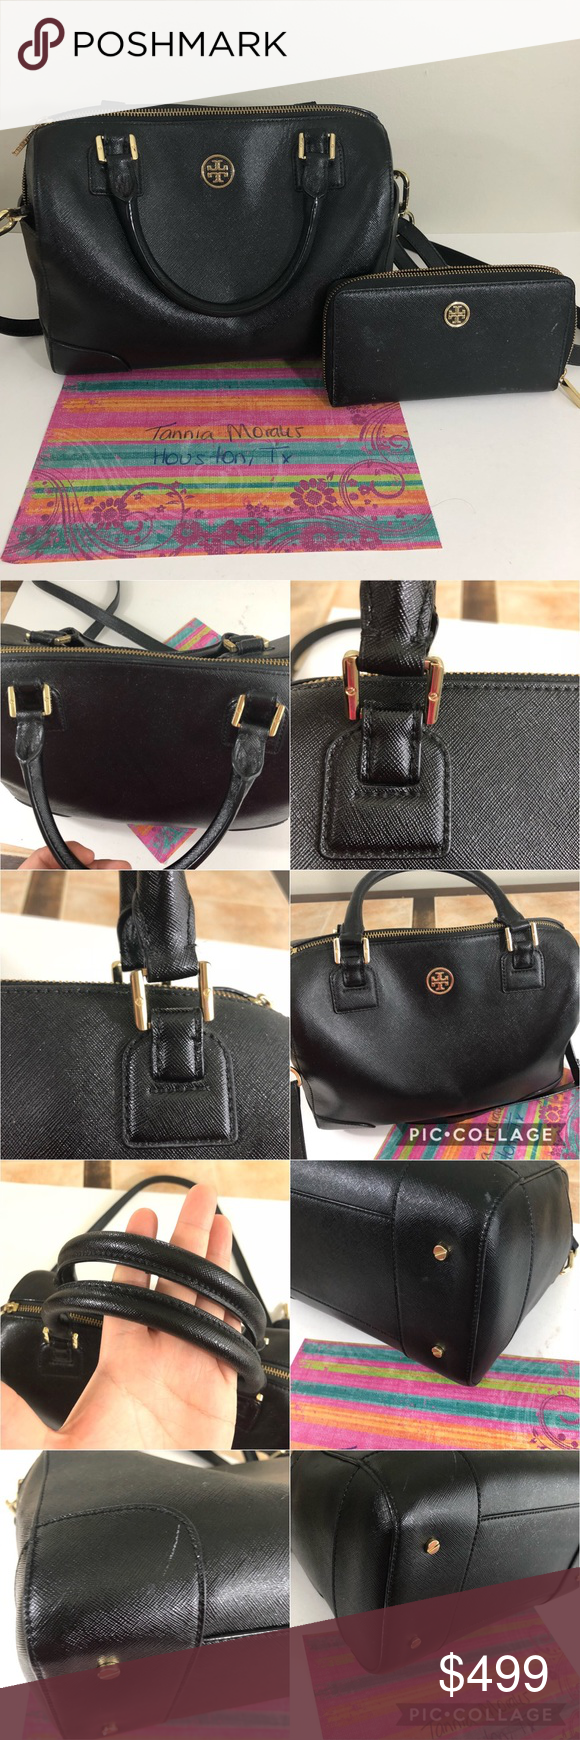 f530e96a8ba Spotted while shopping on Poshmark  Tory Burch Black Midi Robinson Handbag  OBO!  poshmark  fashion  shopping  style  Tory Burch  Handbags